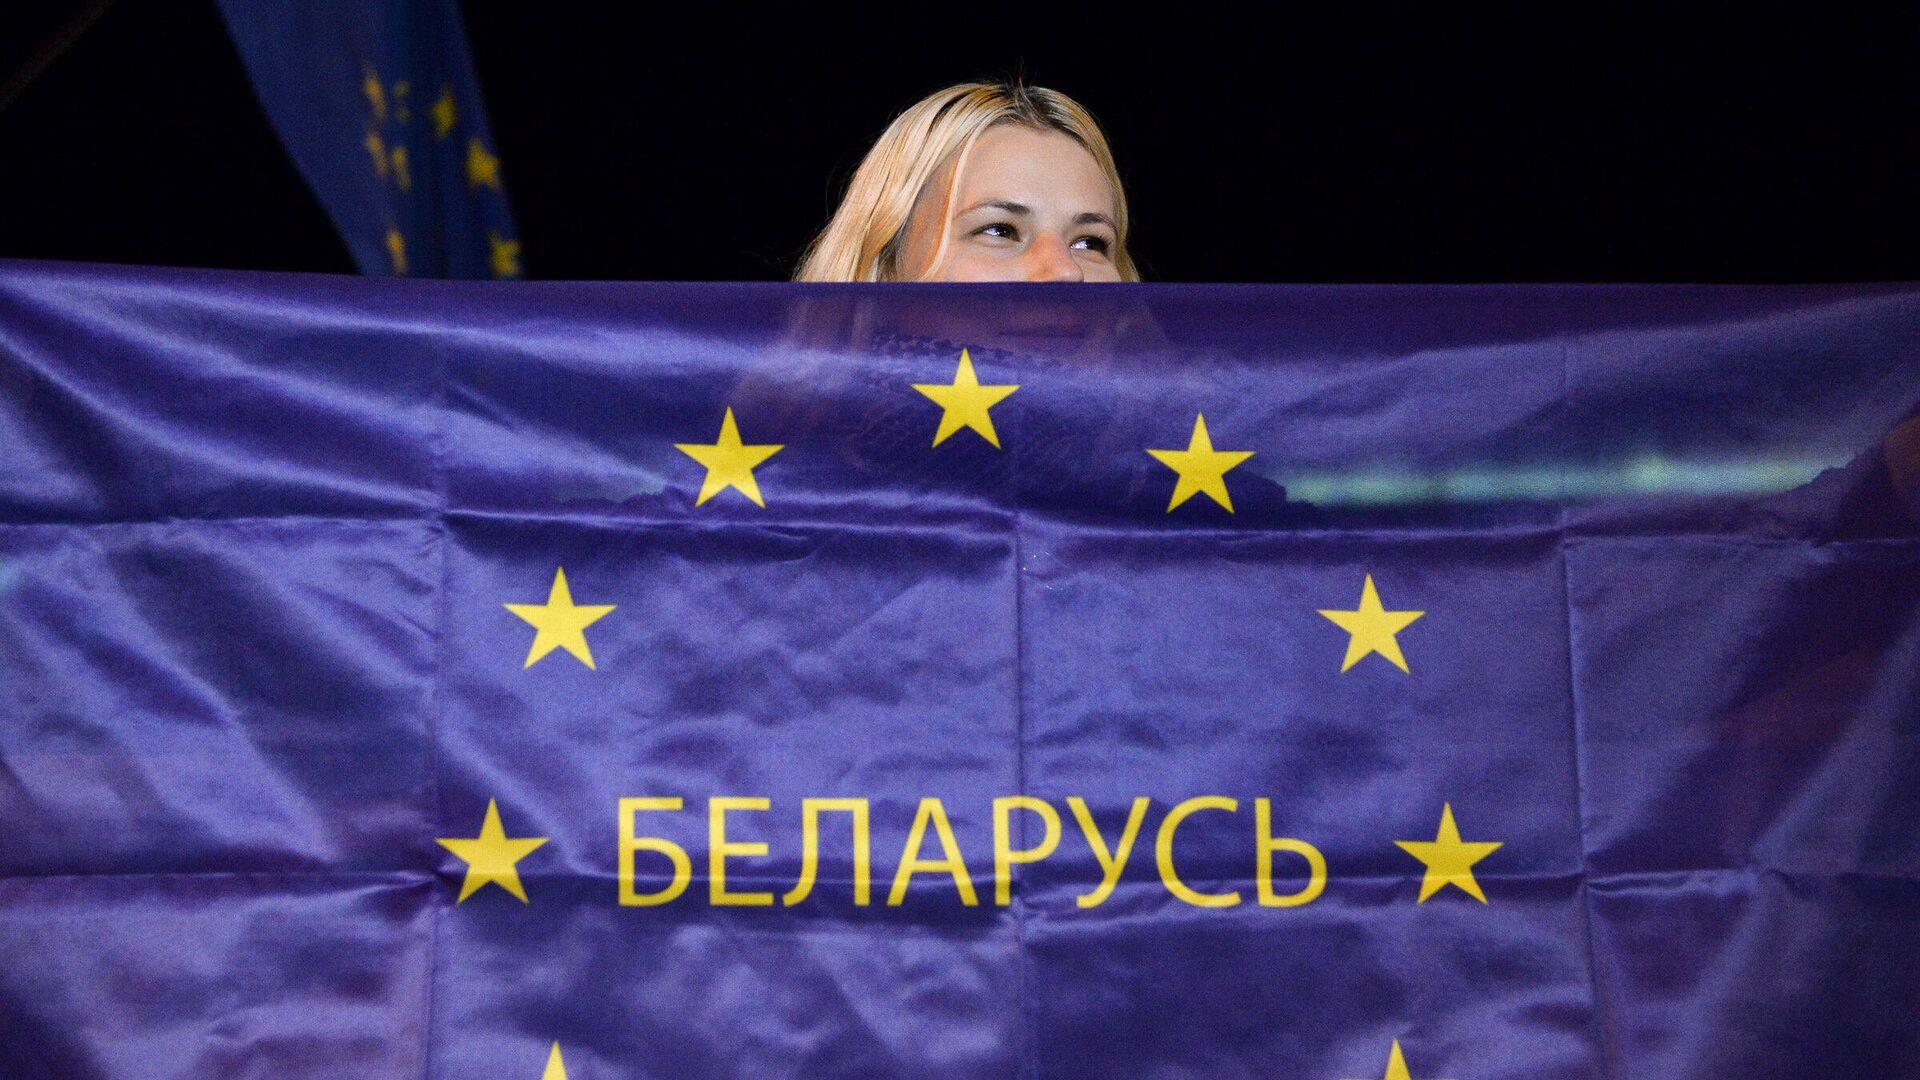 Девушка с флагом ЕС и надписью Беларусь в Минске - РИА Новости, 1920, 15.09.2020